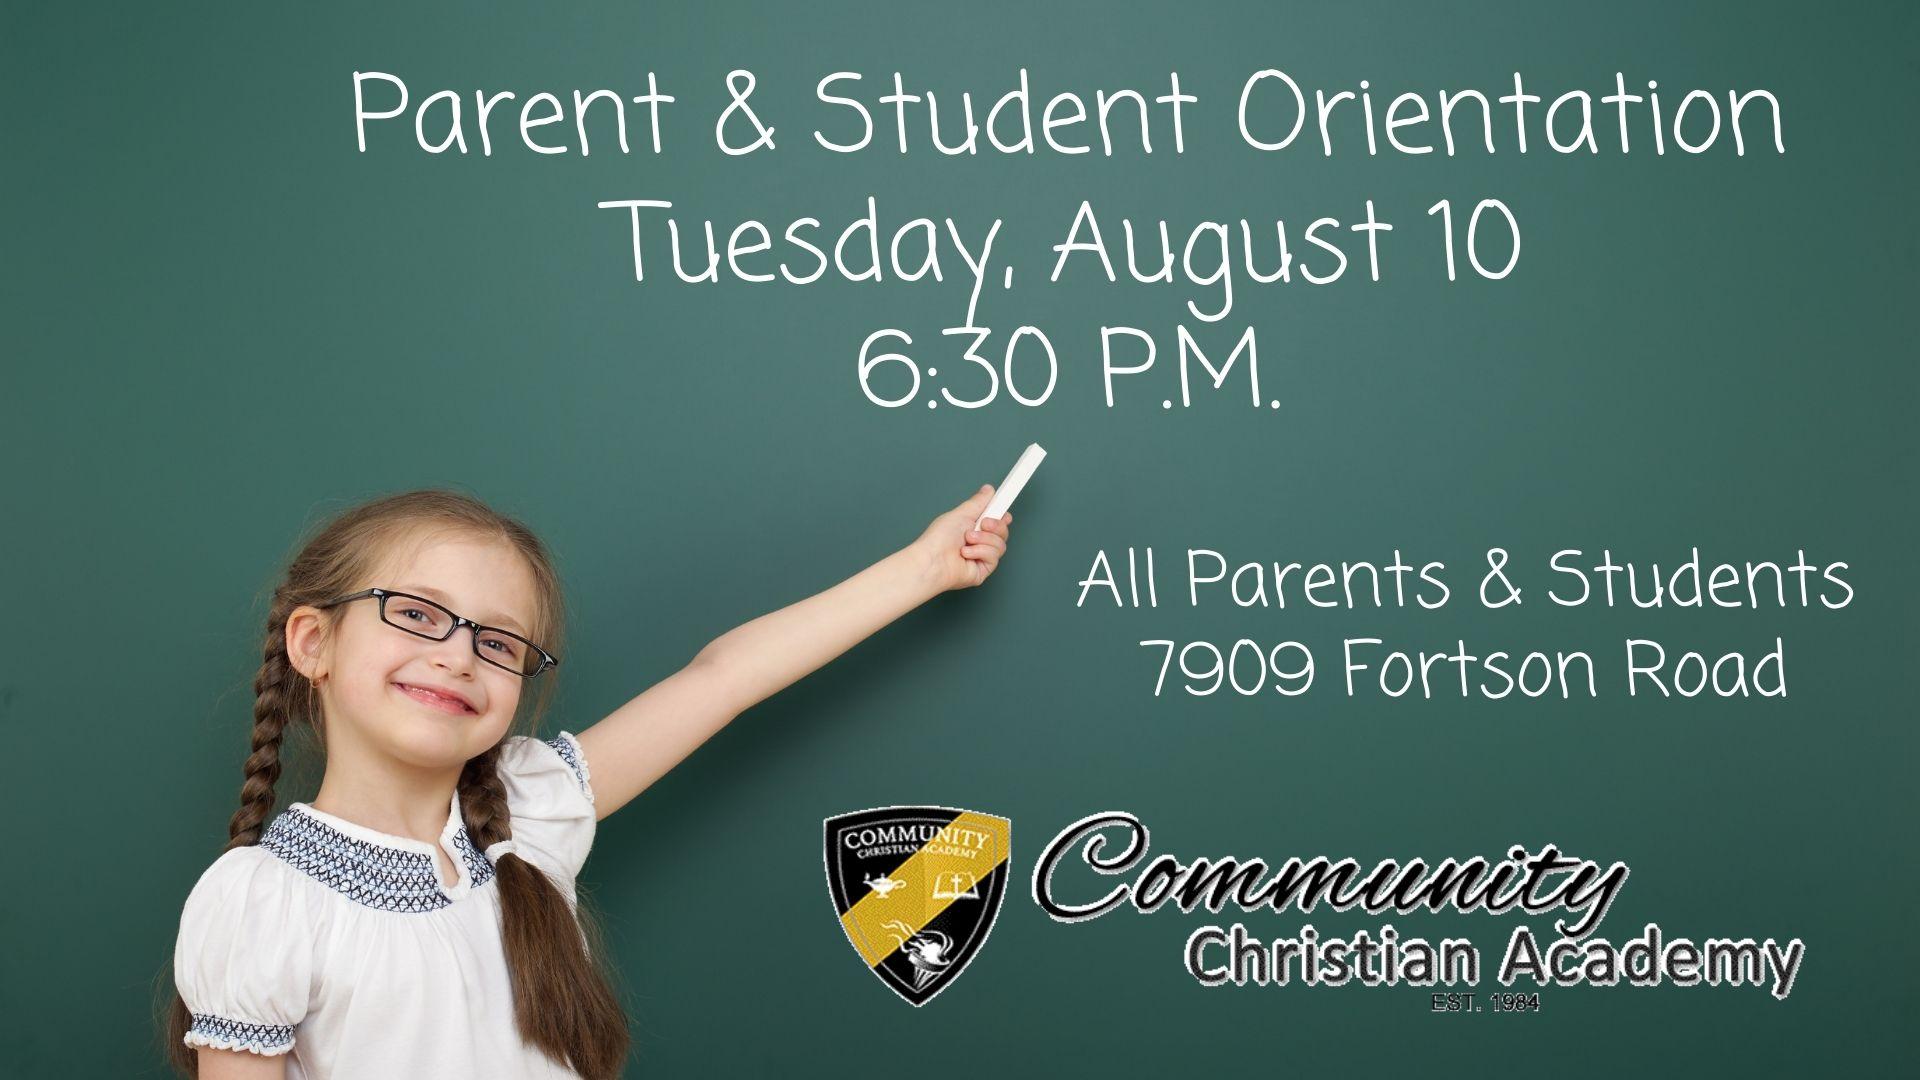 image for Parent & Student Orientation